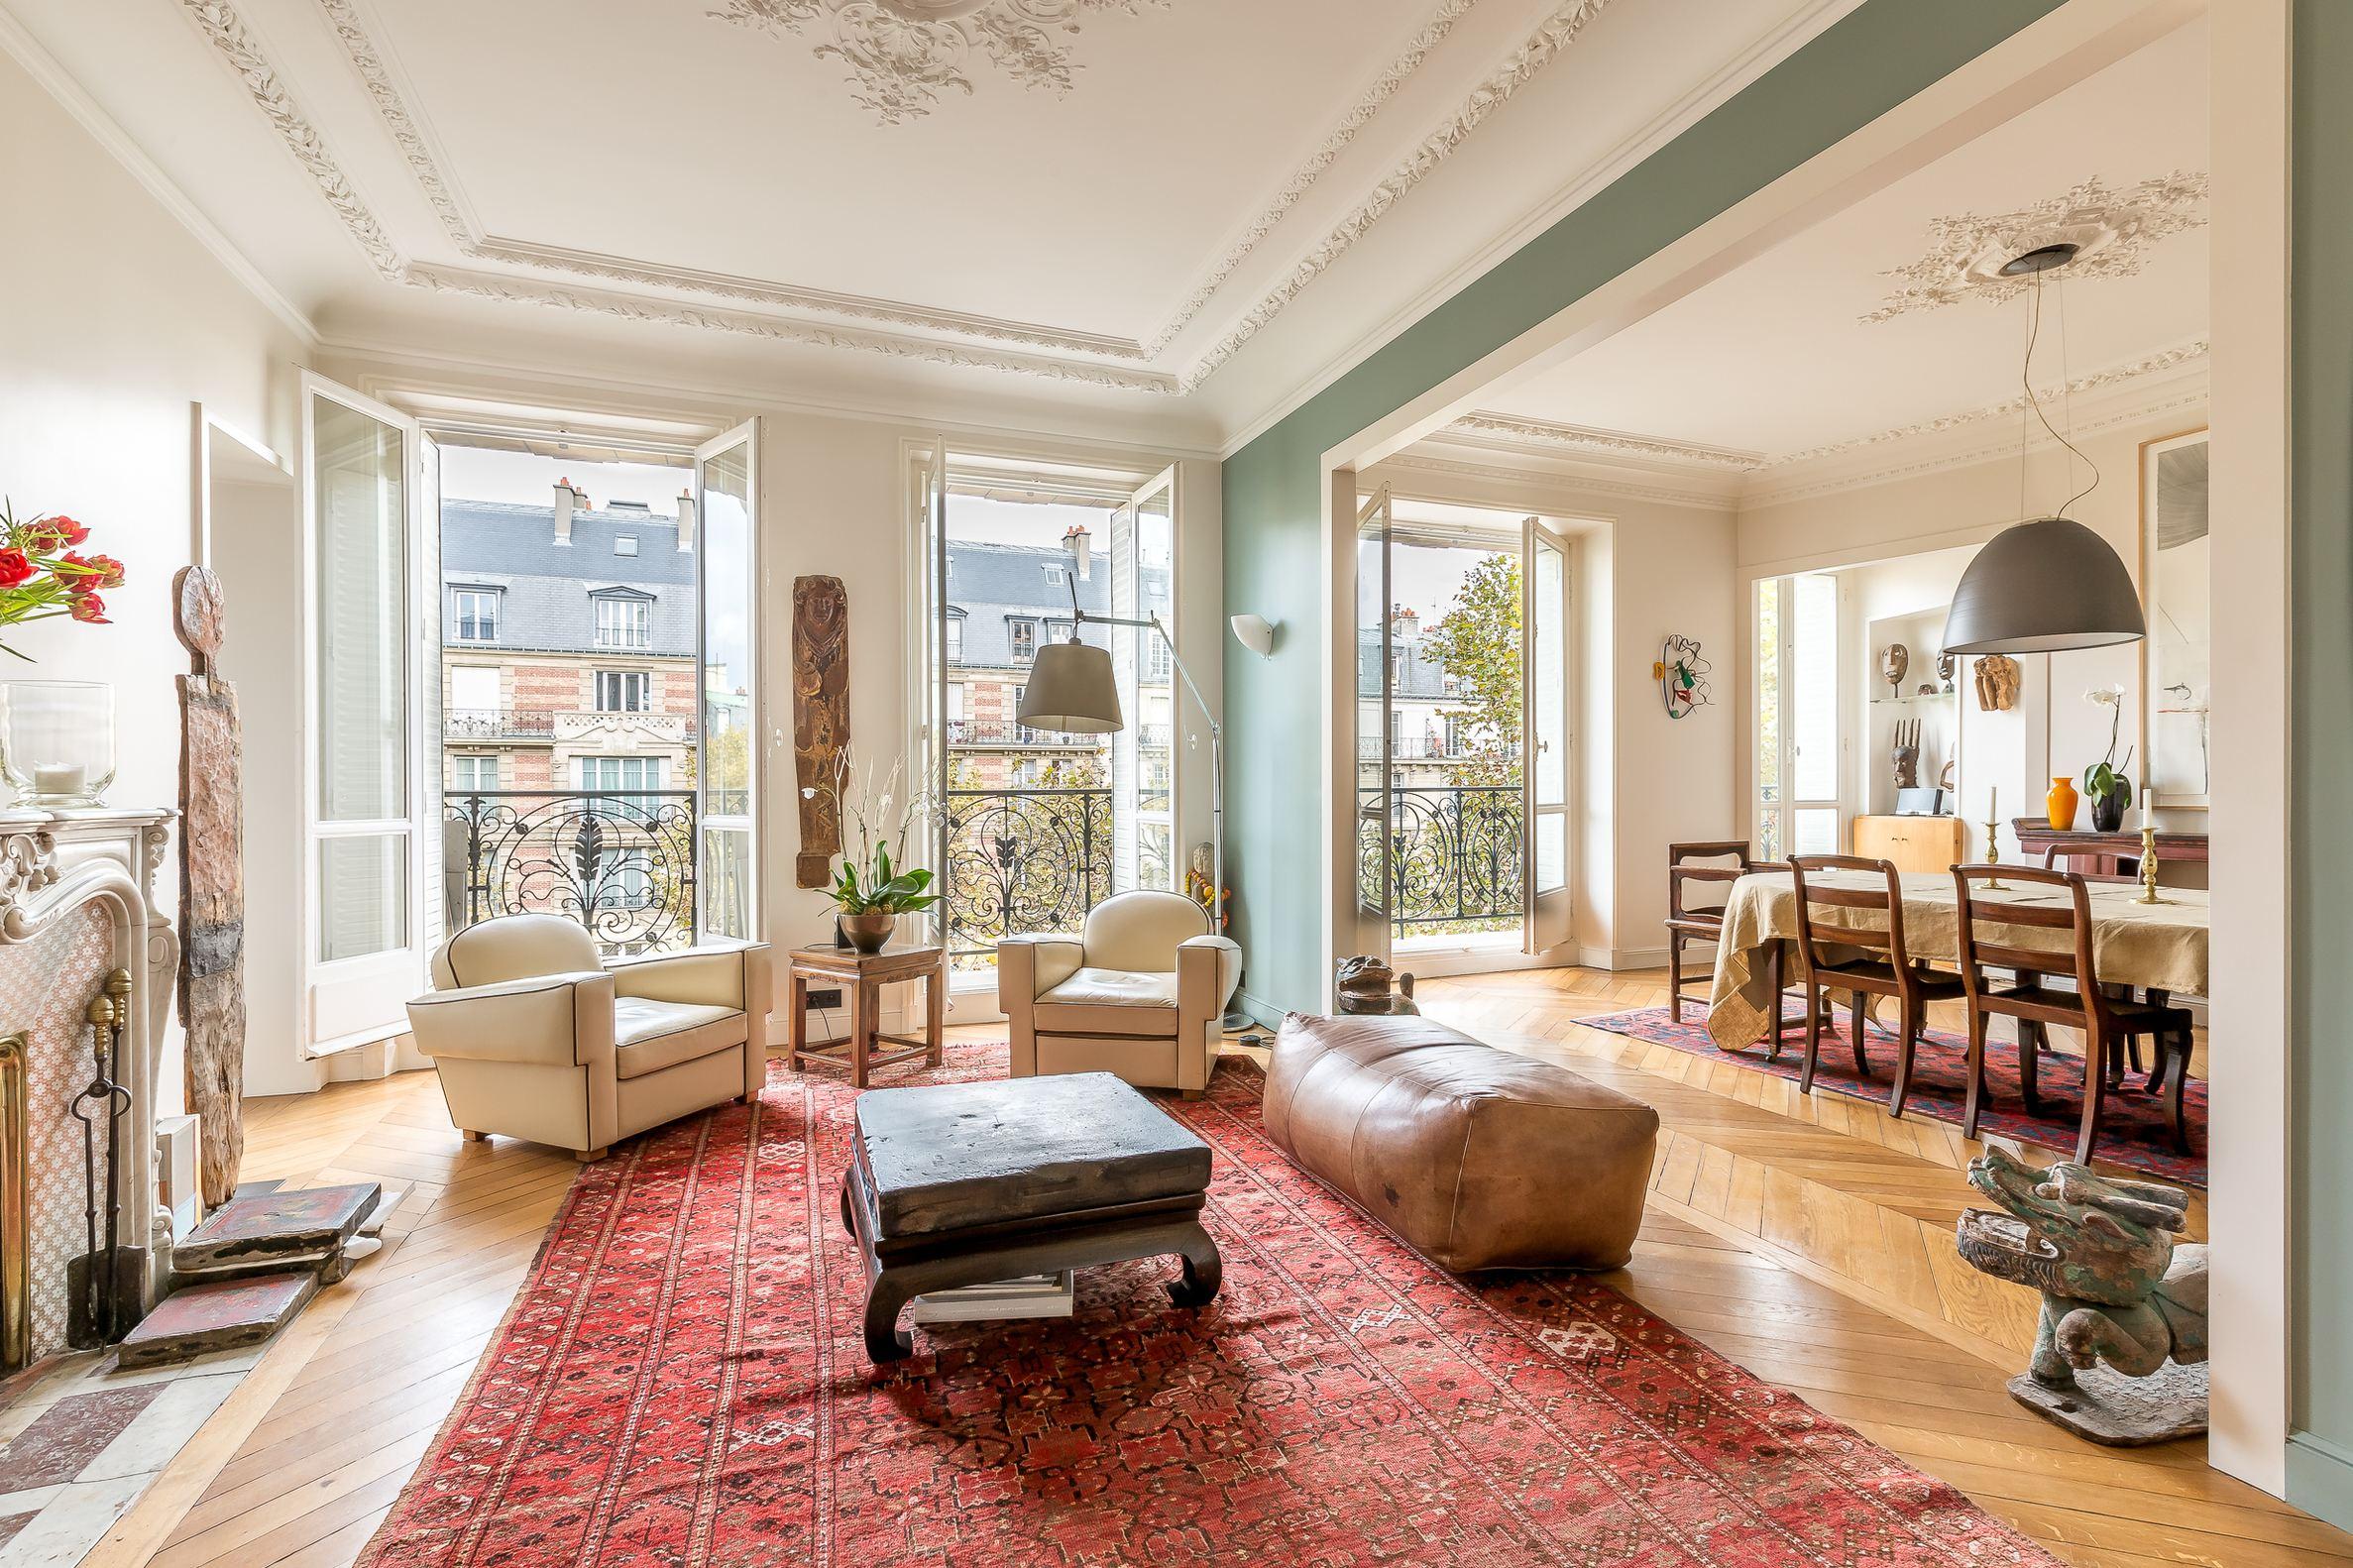 sales property at Vavin - Montparnasse : Elegant renovated apartment